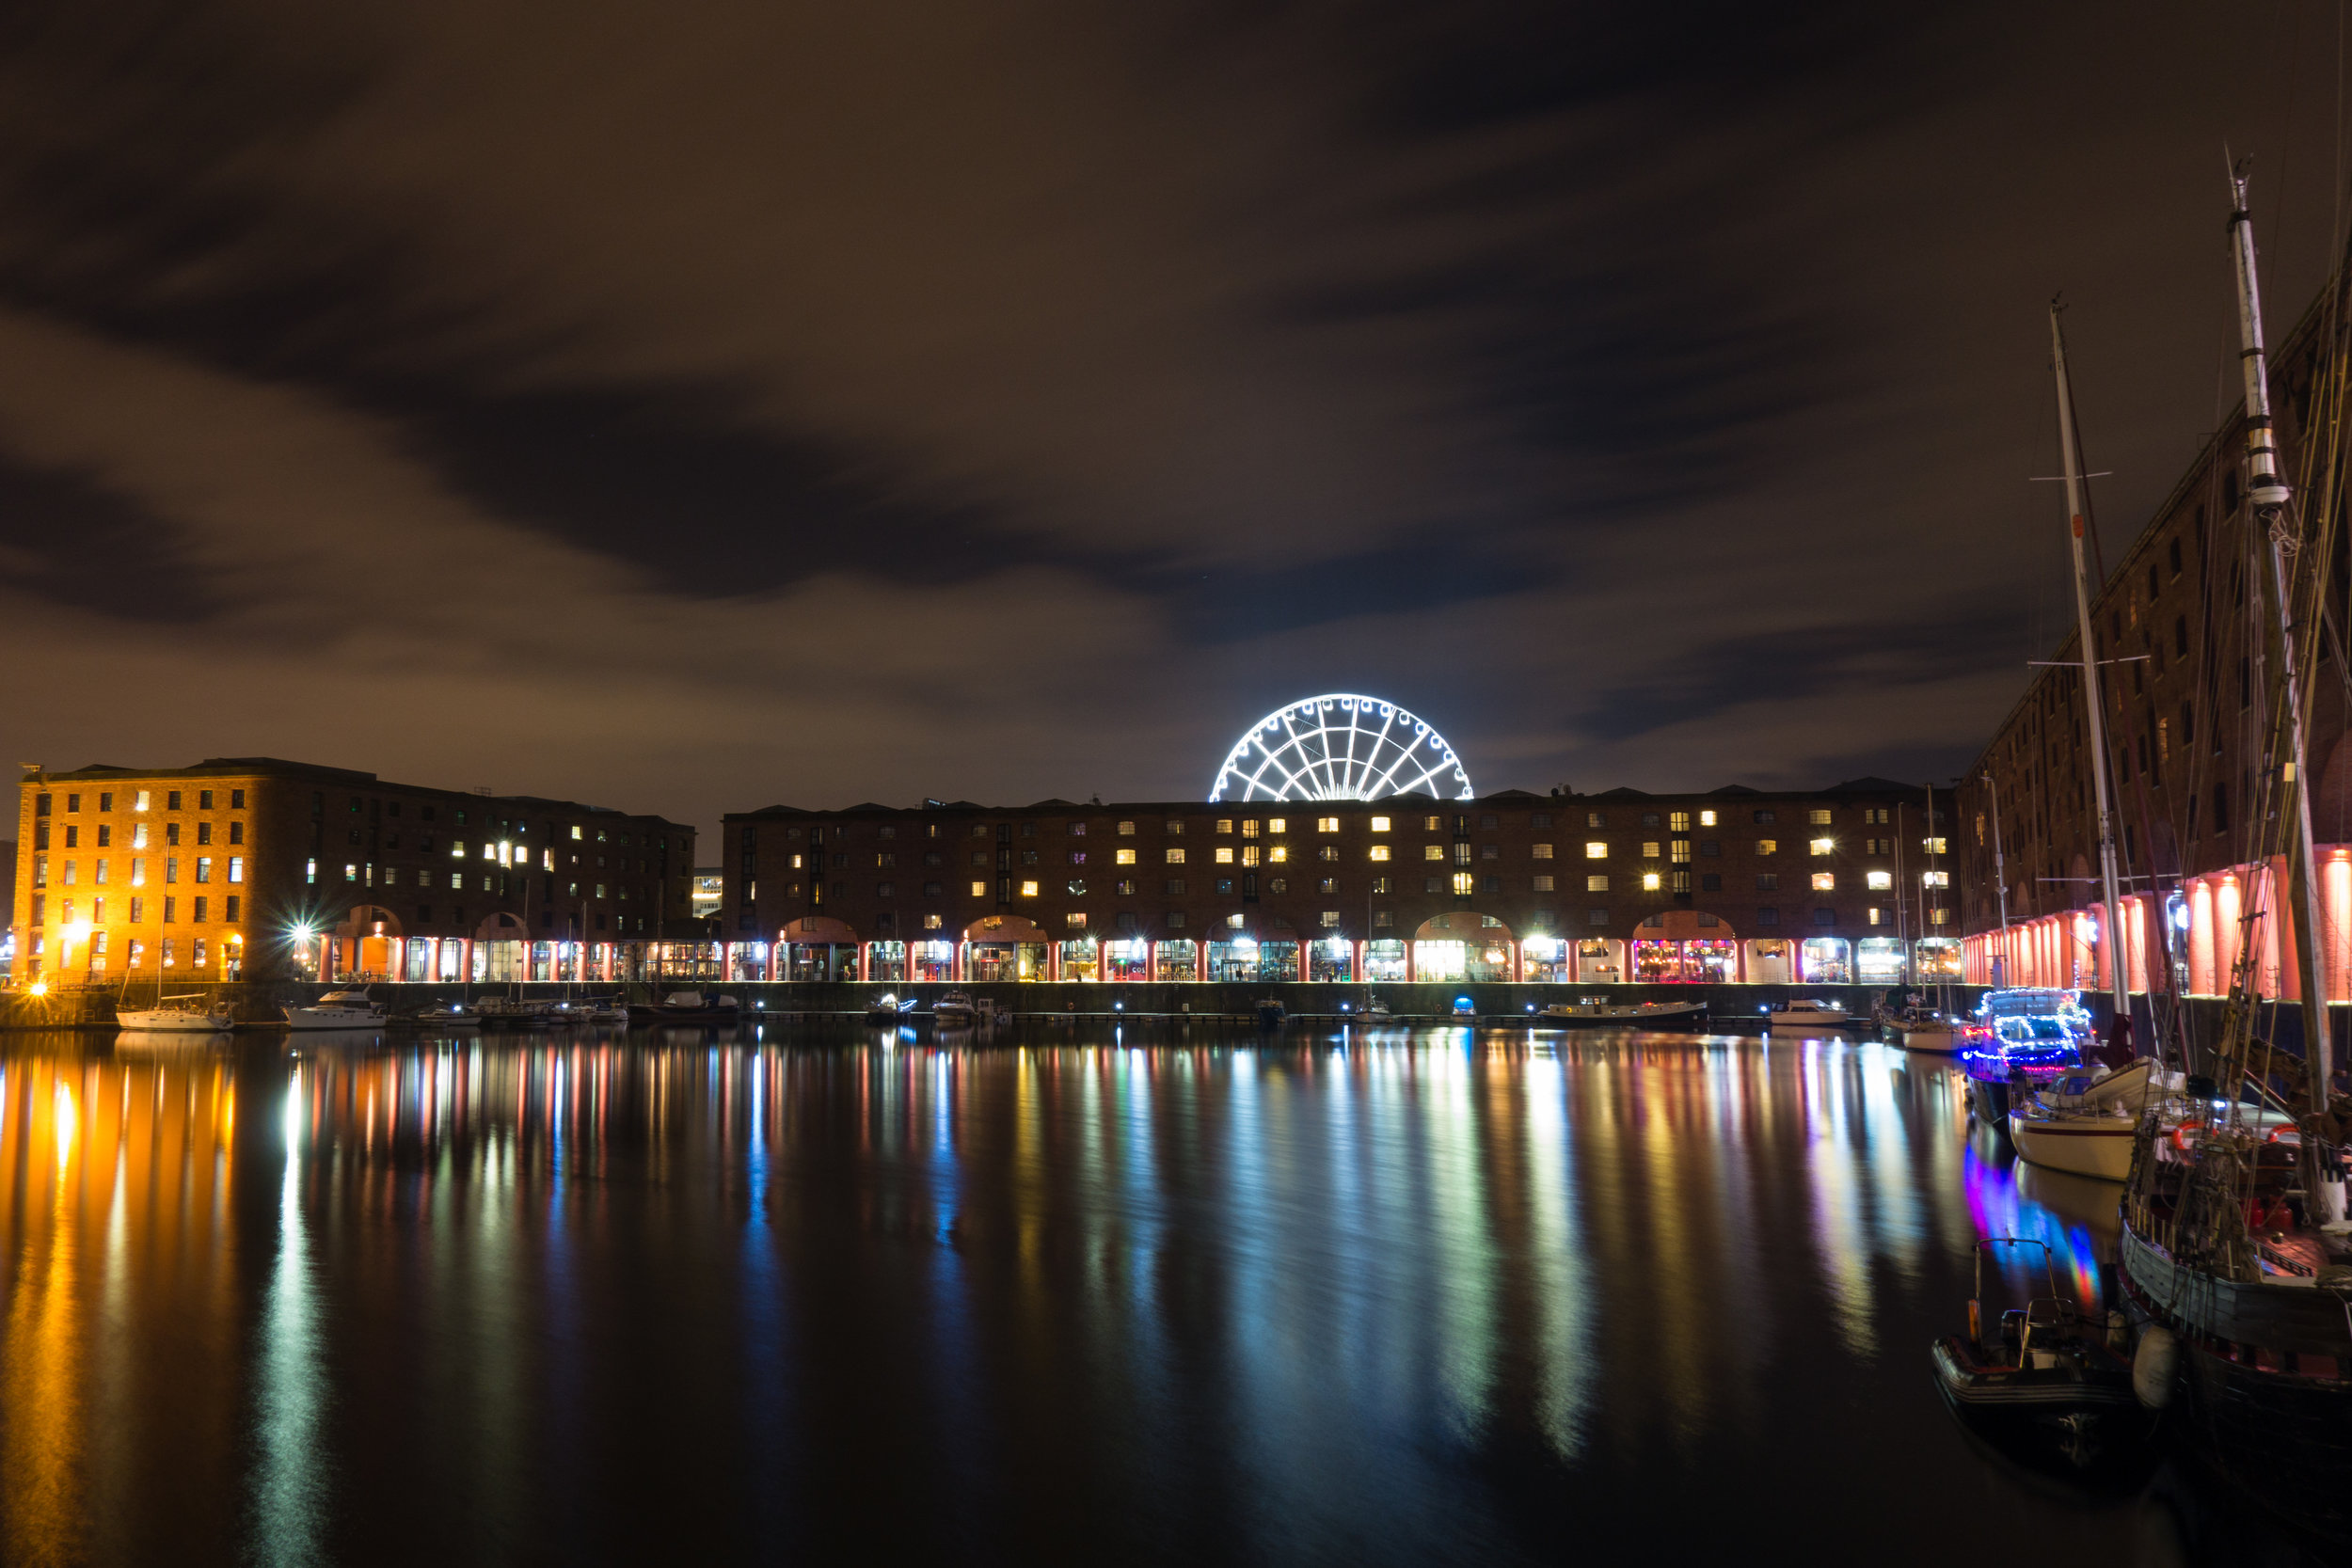 Albert dock & wheel-2.jpg